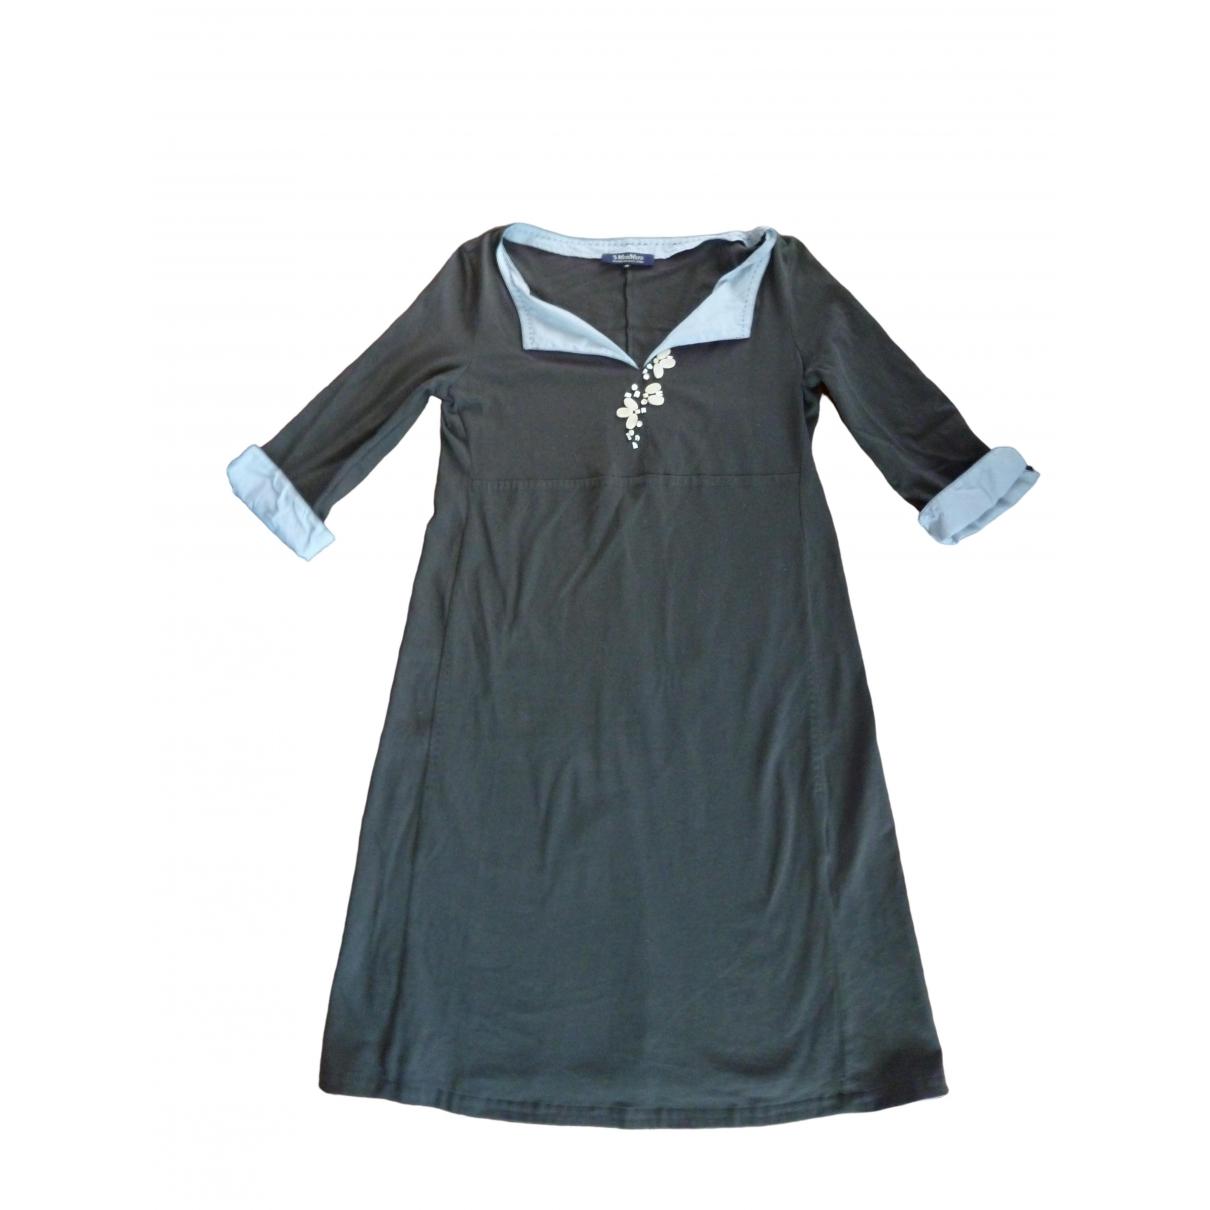 Max Mara s - Robe   pour femme en coton - elasthane - marron